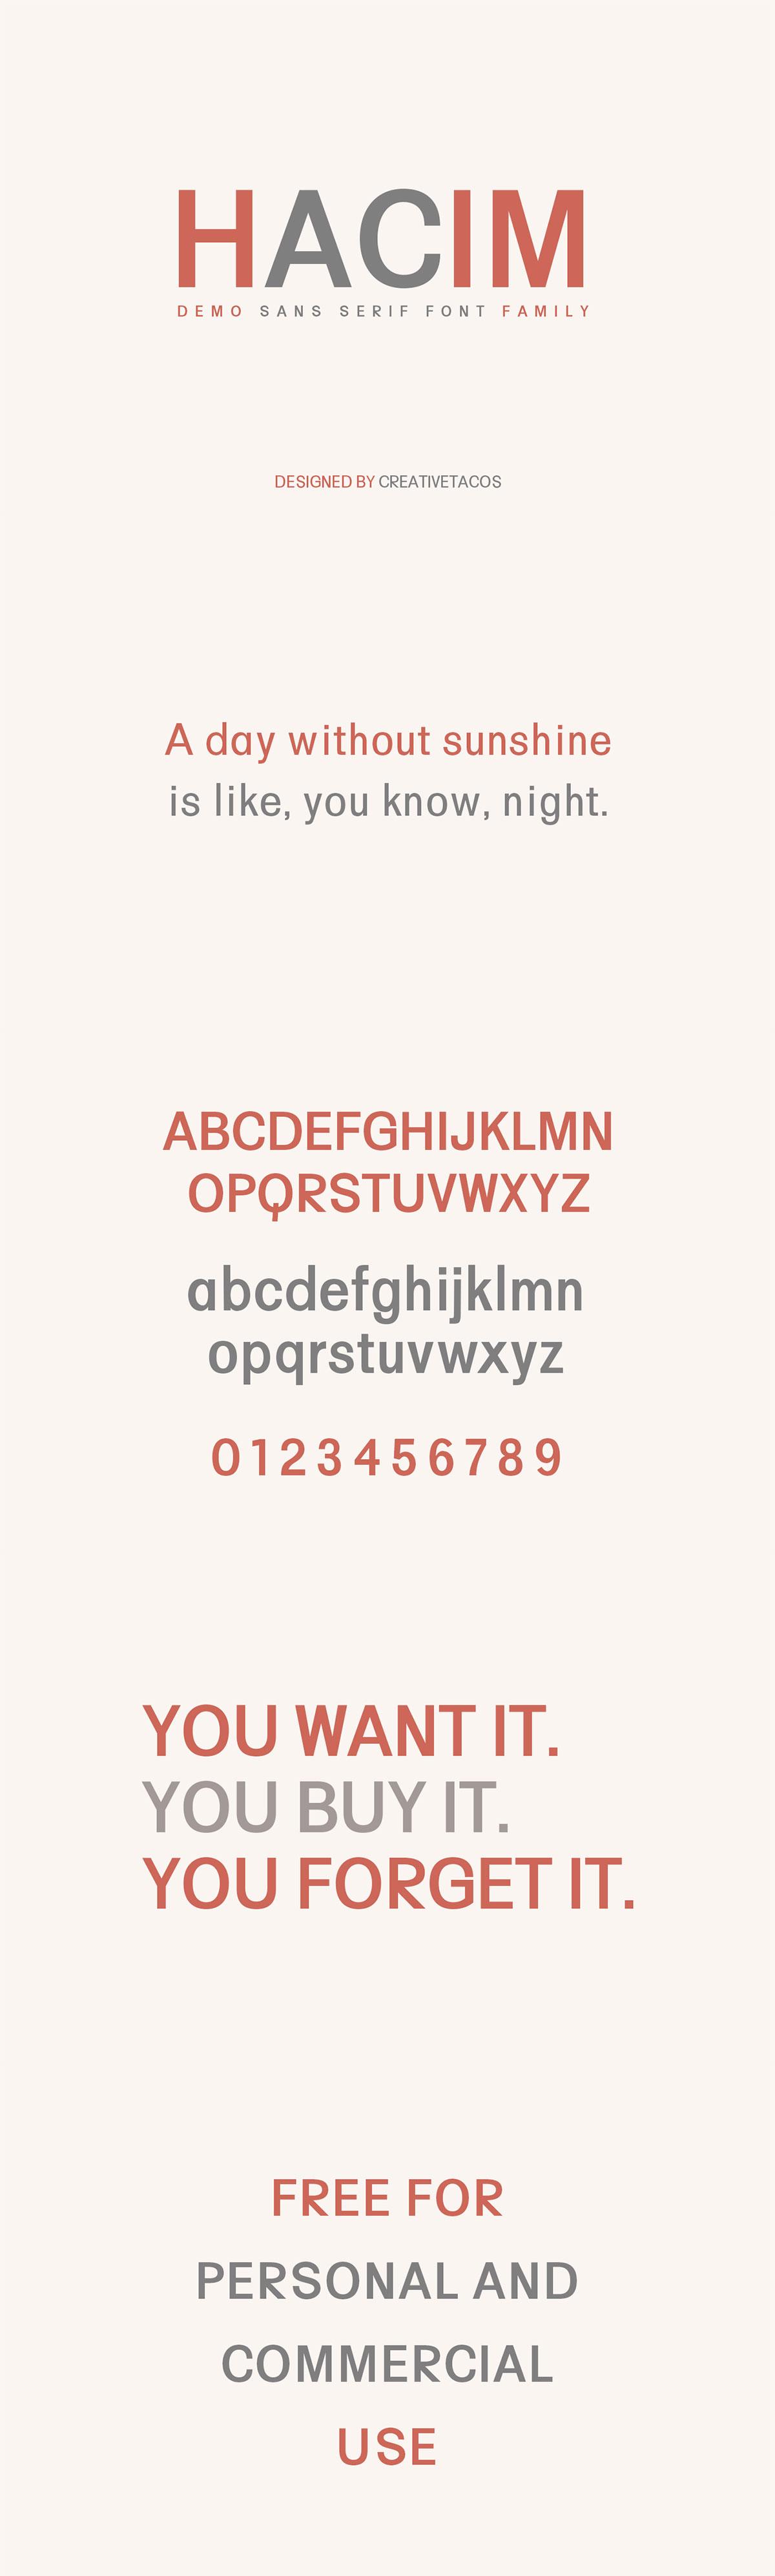 Free Hacim Sans Serif Font Family